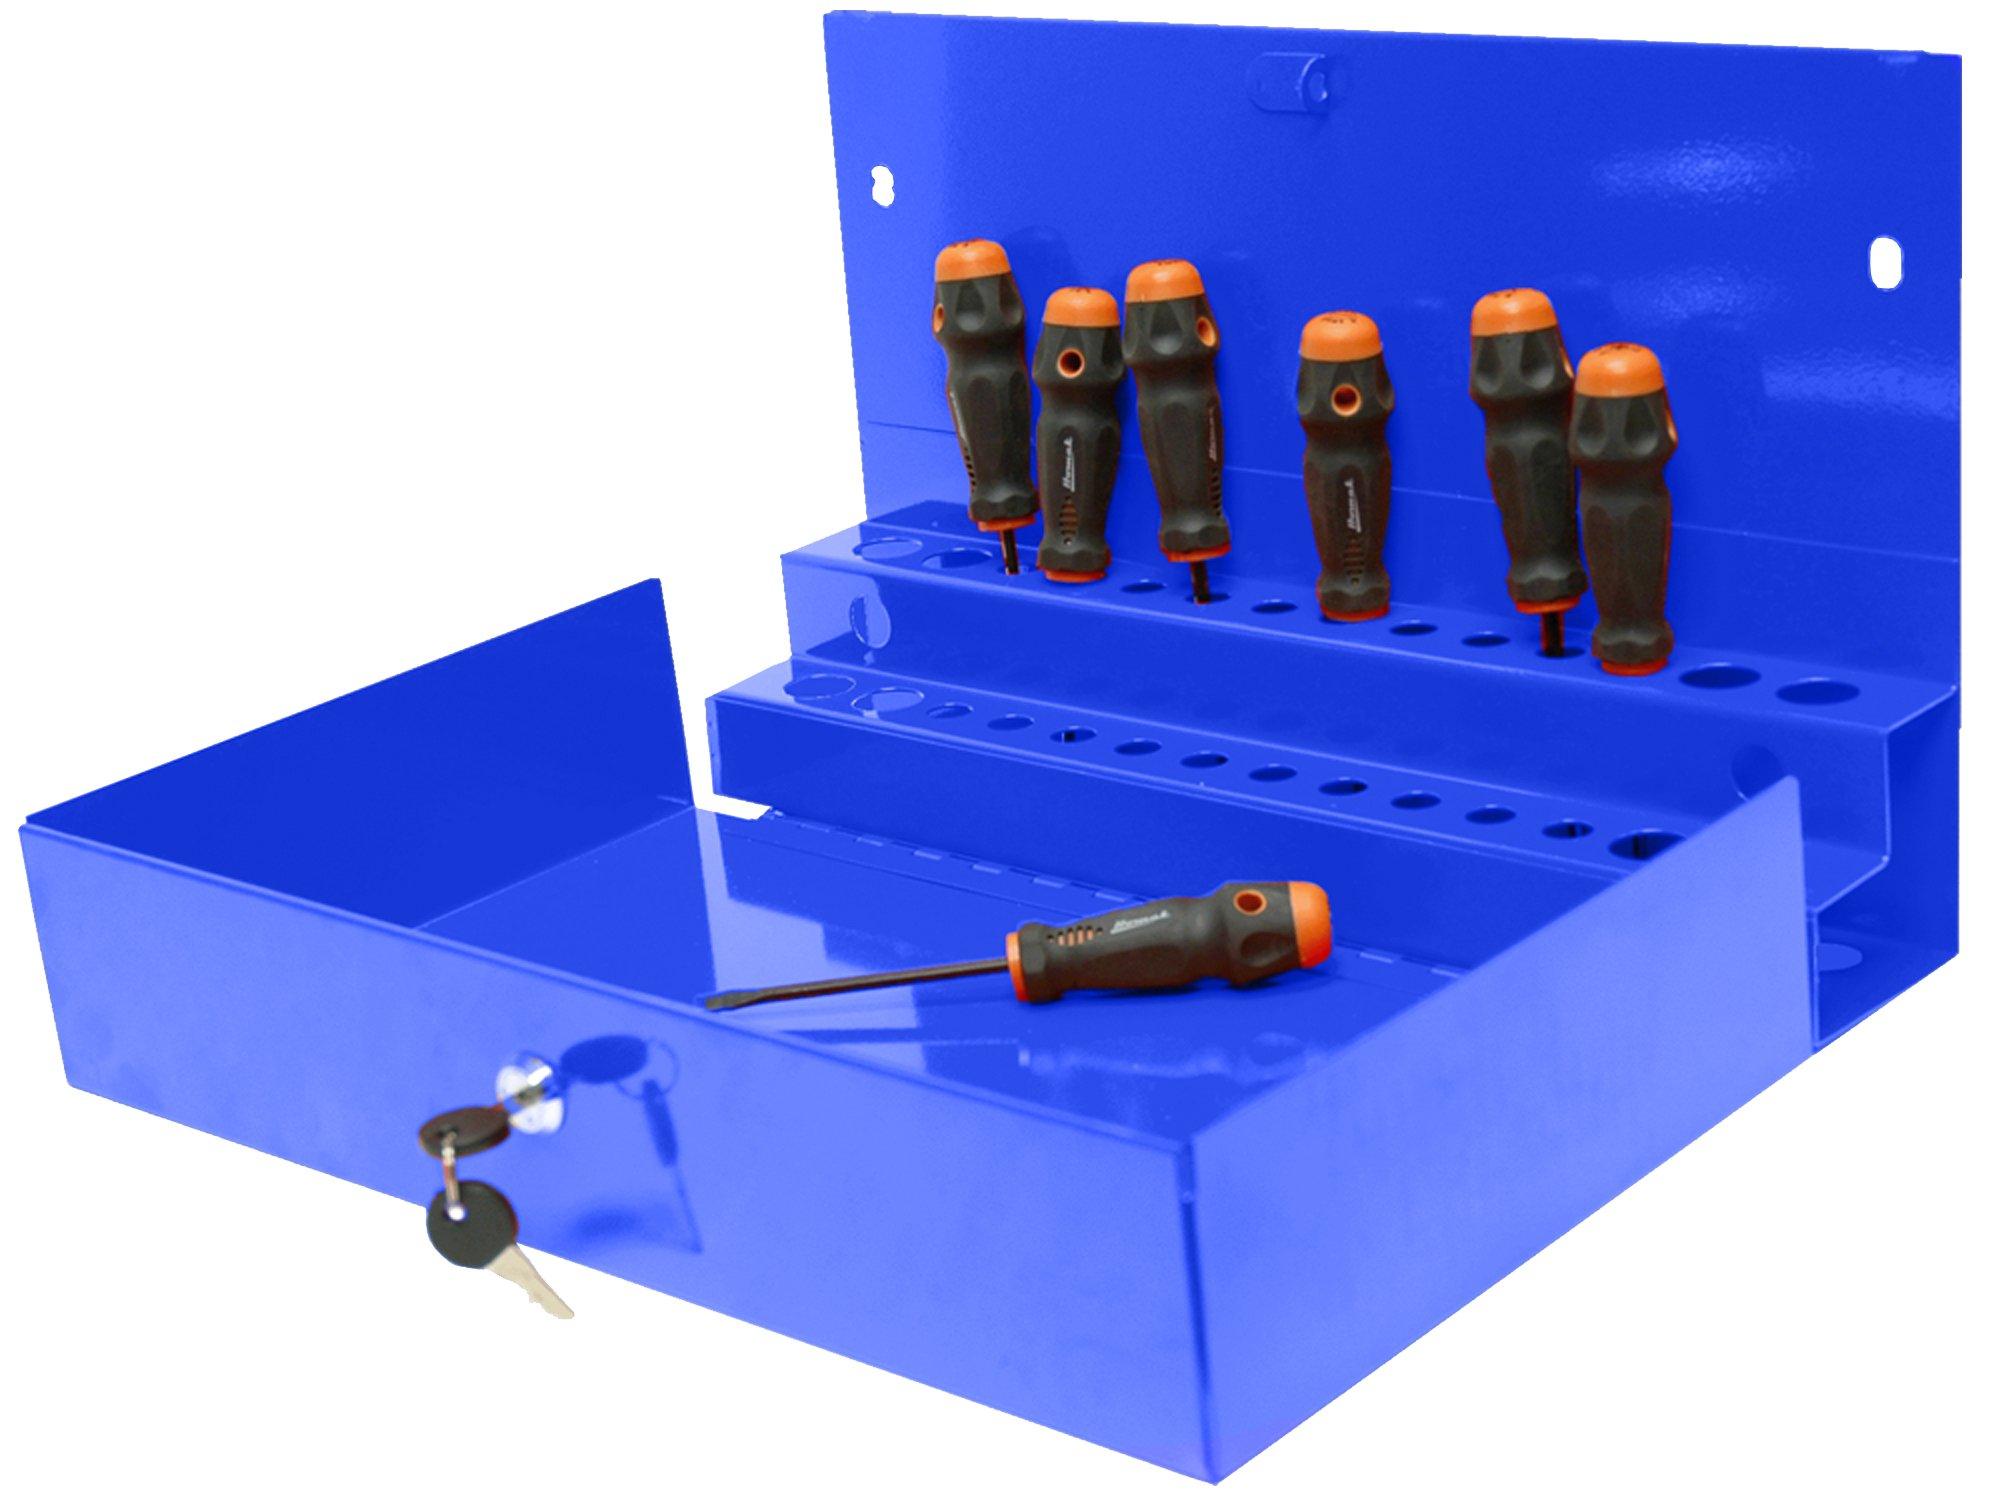 Homak 27-Inch Professional Series Locking Tool Organizer, Blue, BL08002601 by Homak Mfg. Co., Inc. (Image #1)